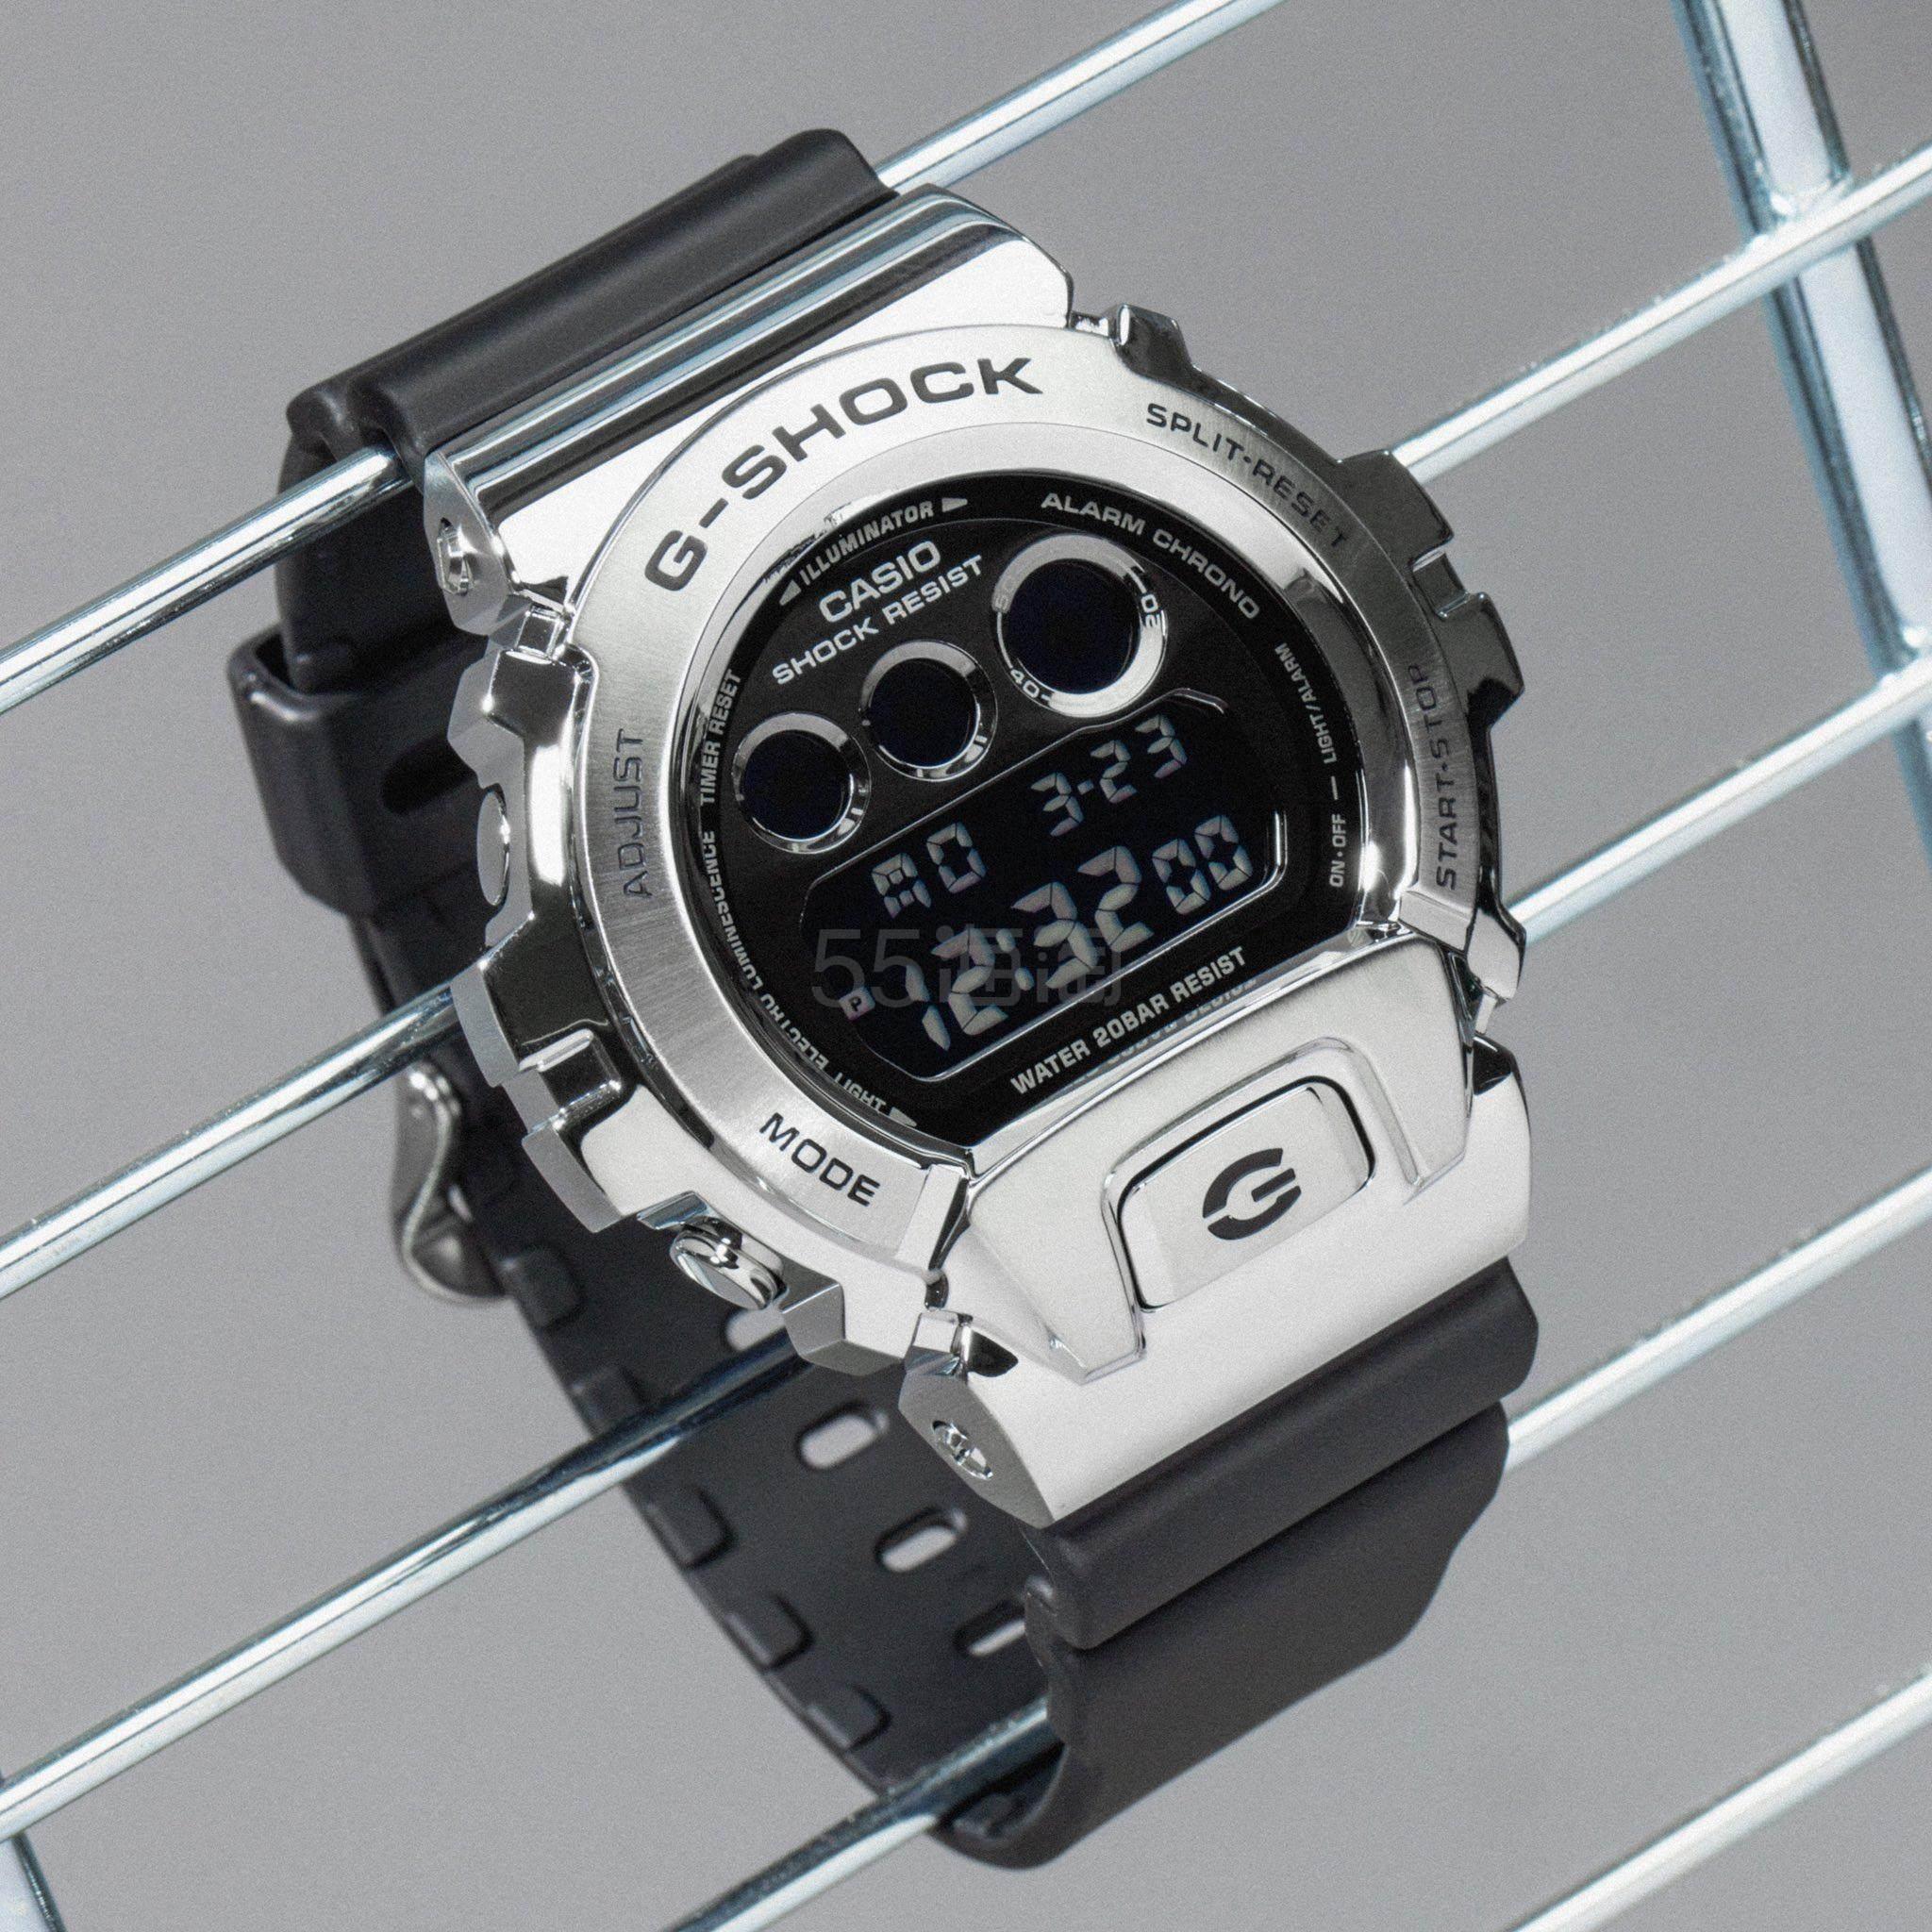 HBX:精选 Casio G-shock 手表 上新 - 海淘优惠海淘折扣 55海淘网